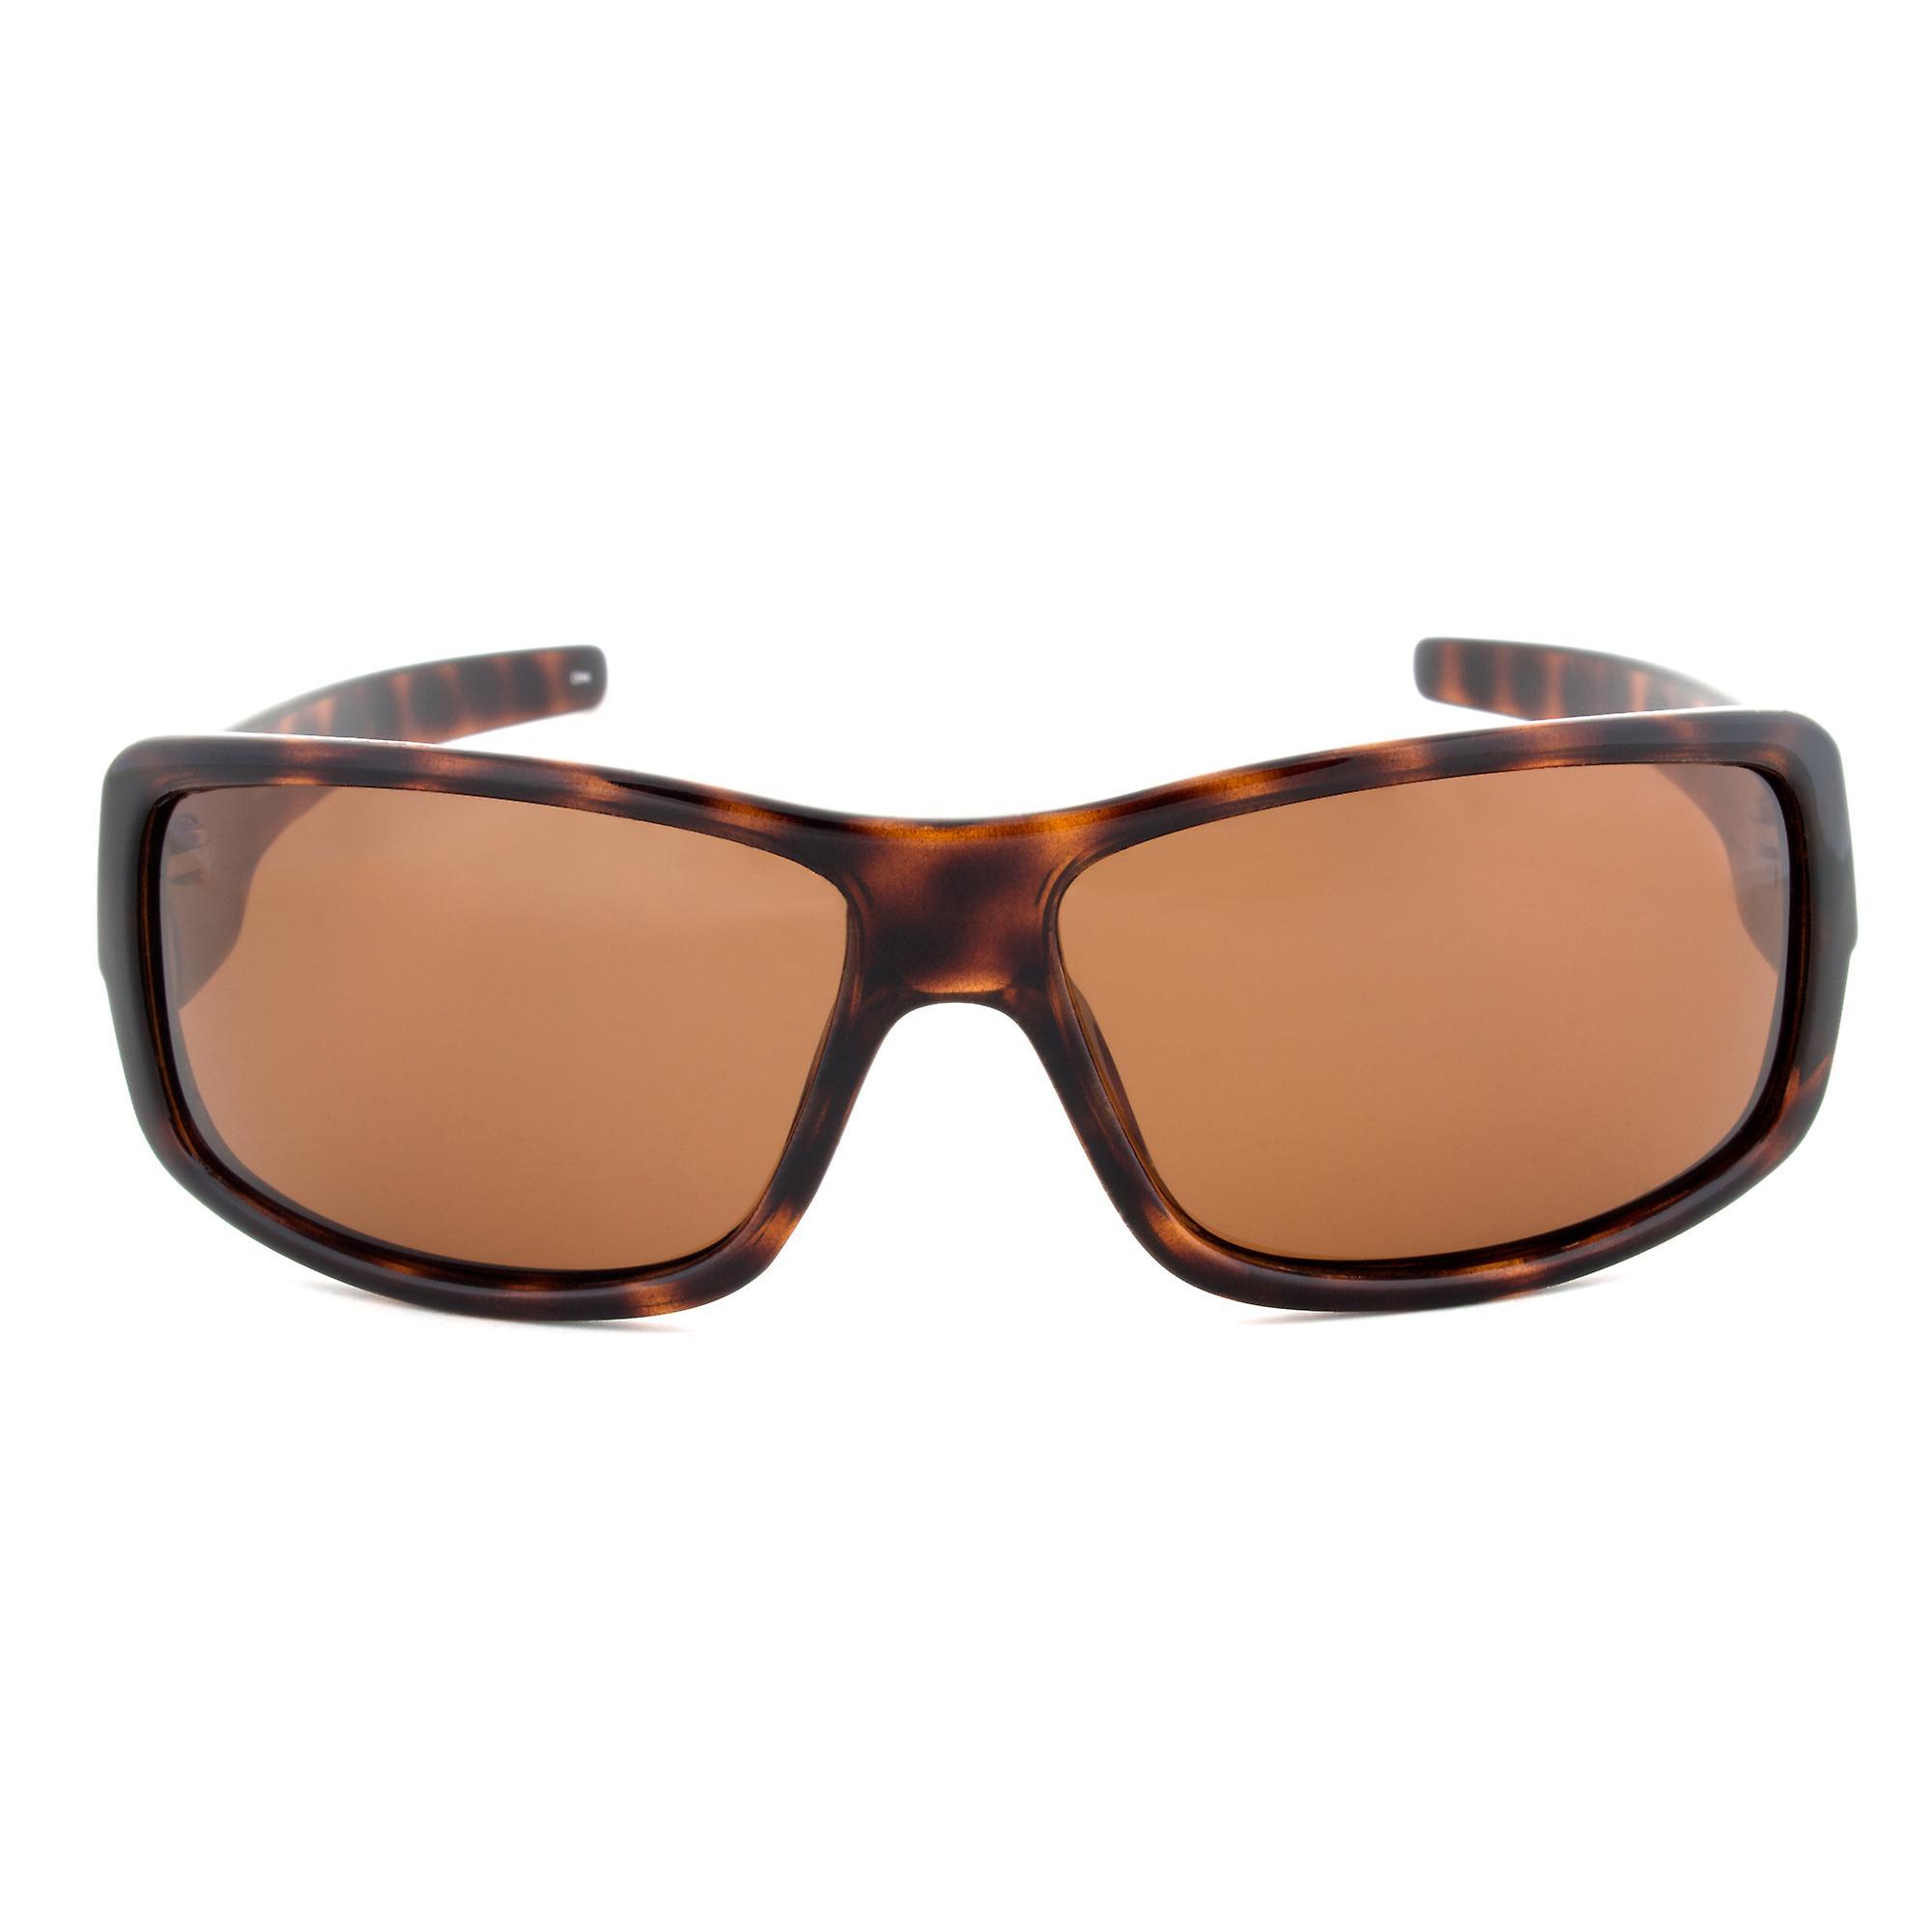 Timberland TB7092 52H Rectangular Sunglasses   Tortoise Brown Frame   Brown Lens